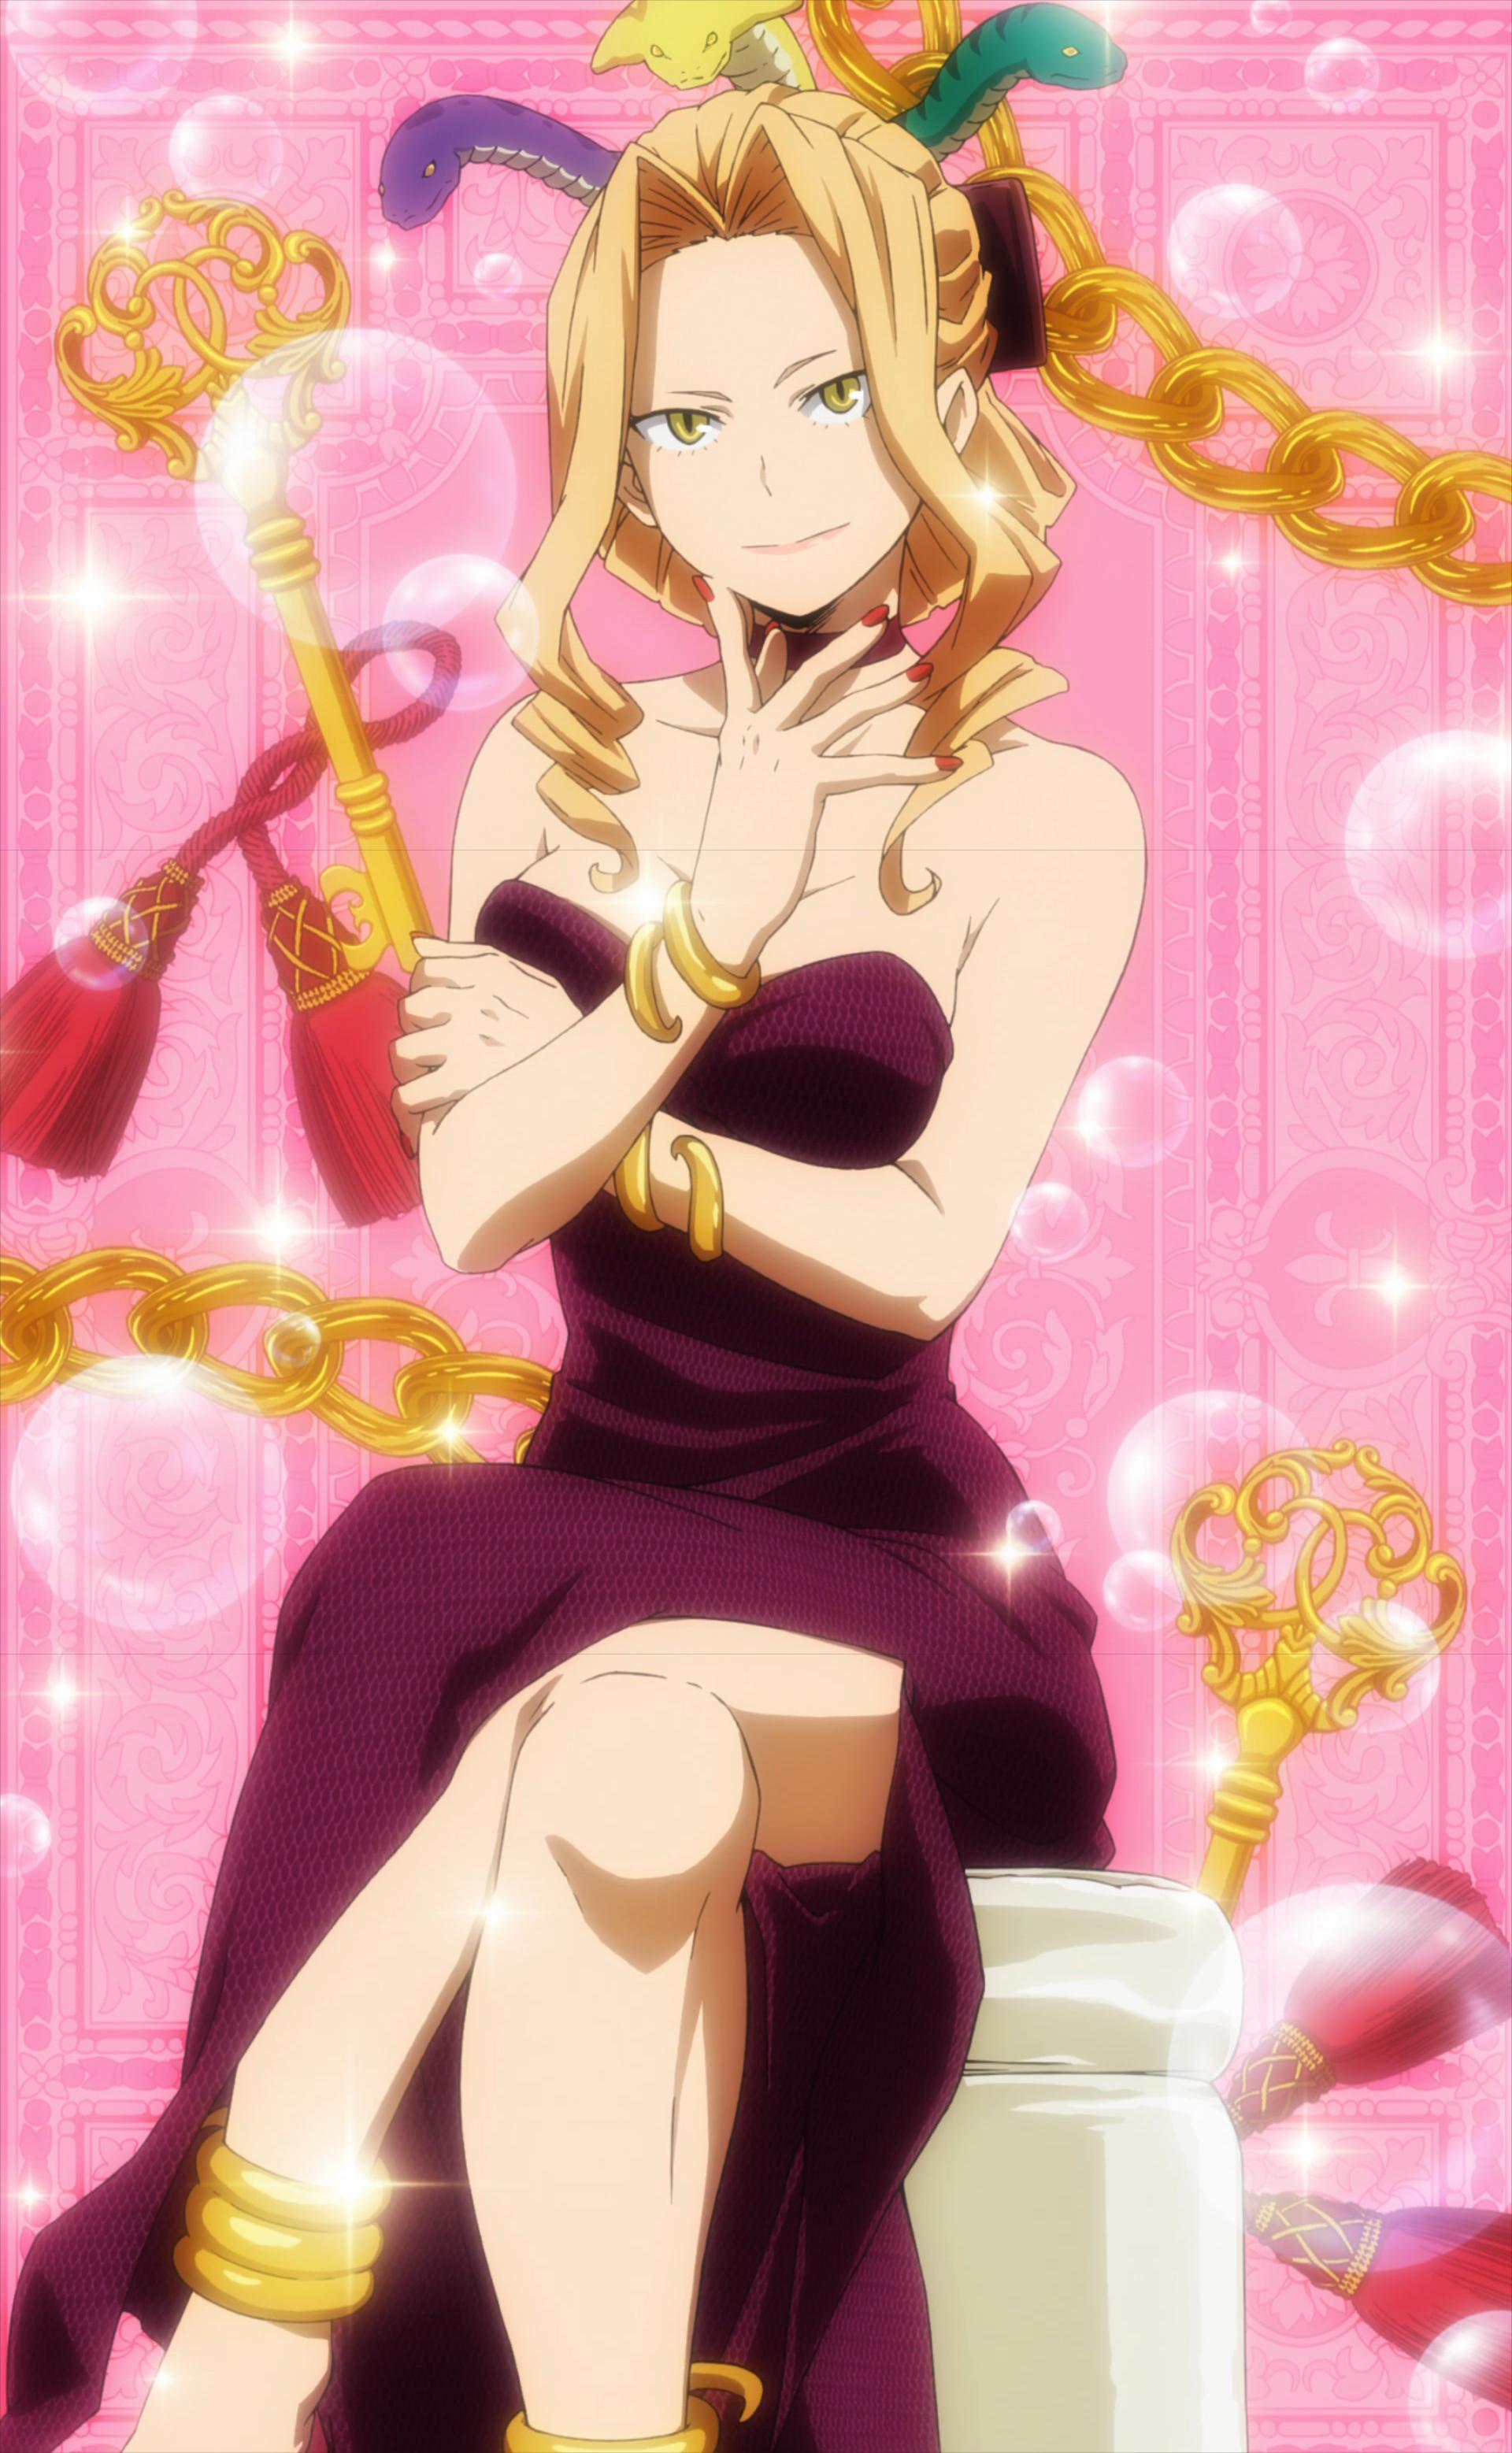 Uwabami Anime My Hero Academia Birthday December 9